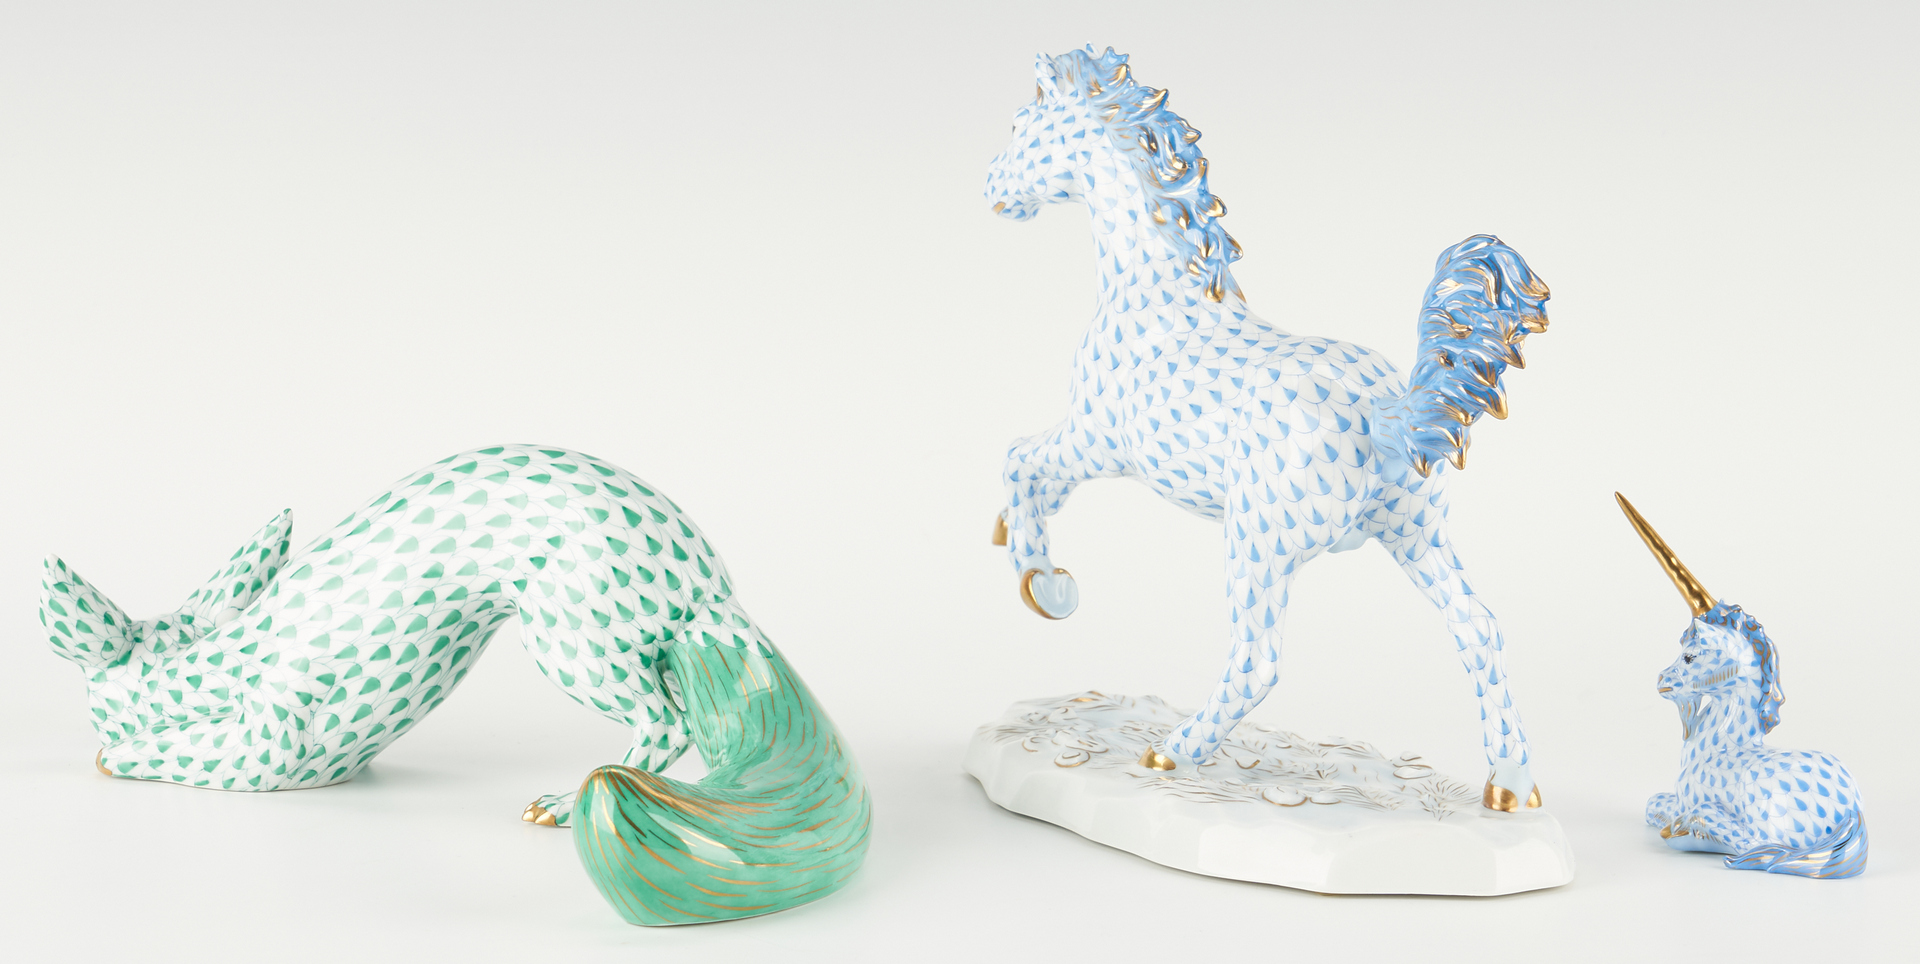 Lot 340: 3 Herend Figurines, incl. Kingdom Classic Stallion, Fox, Unicorn